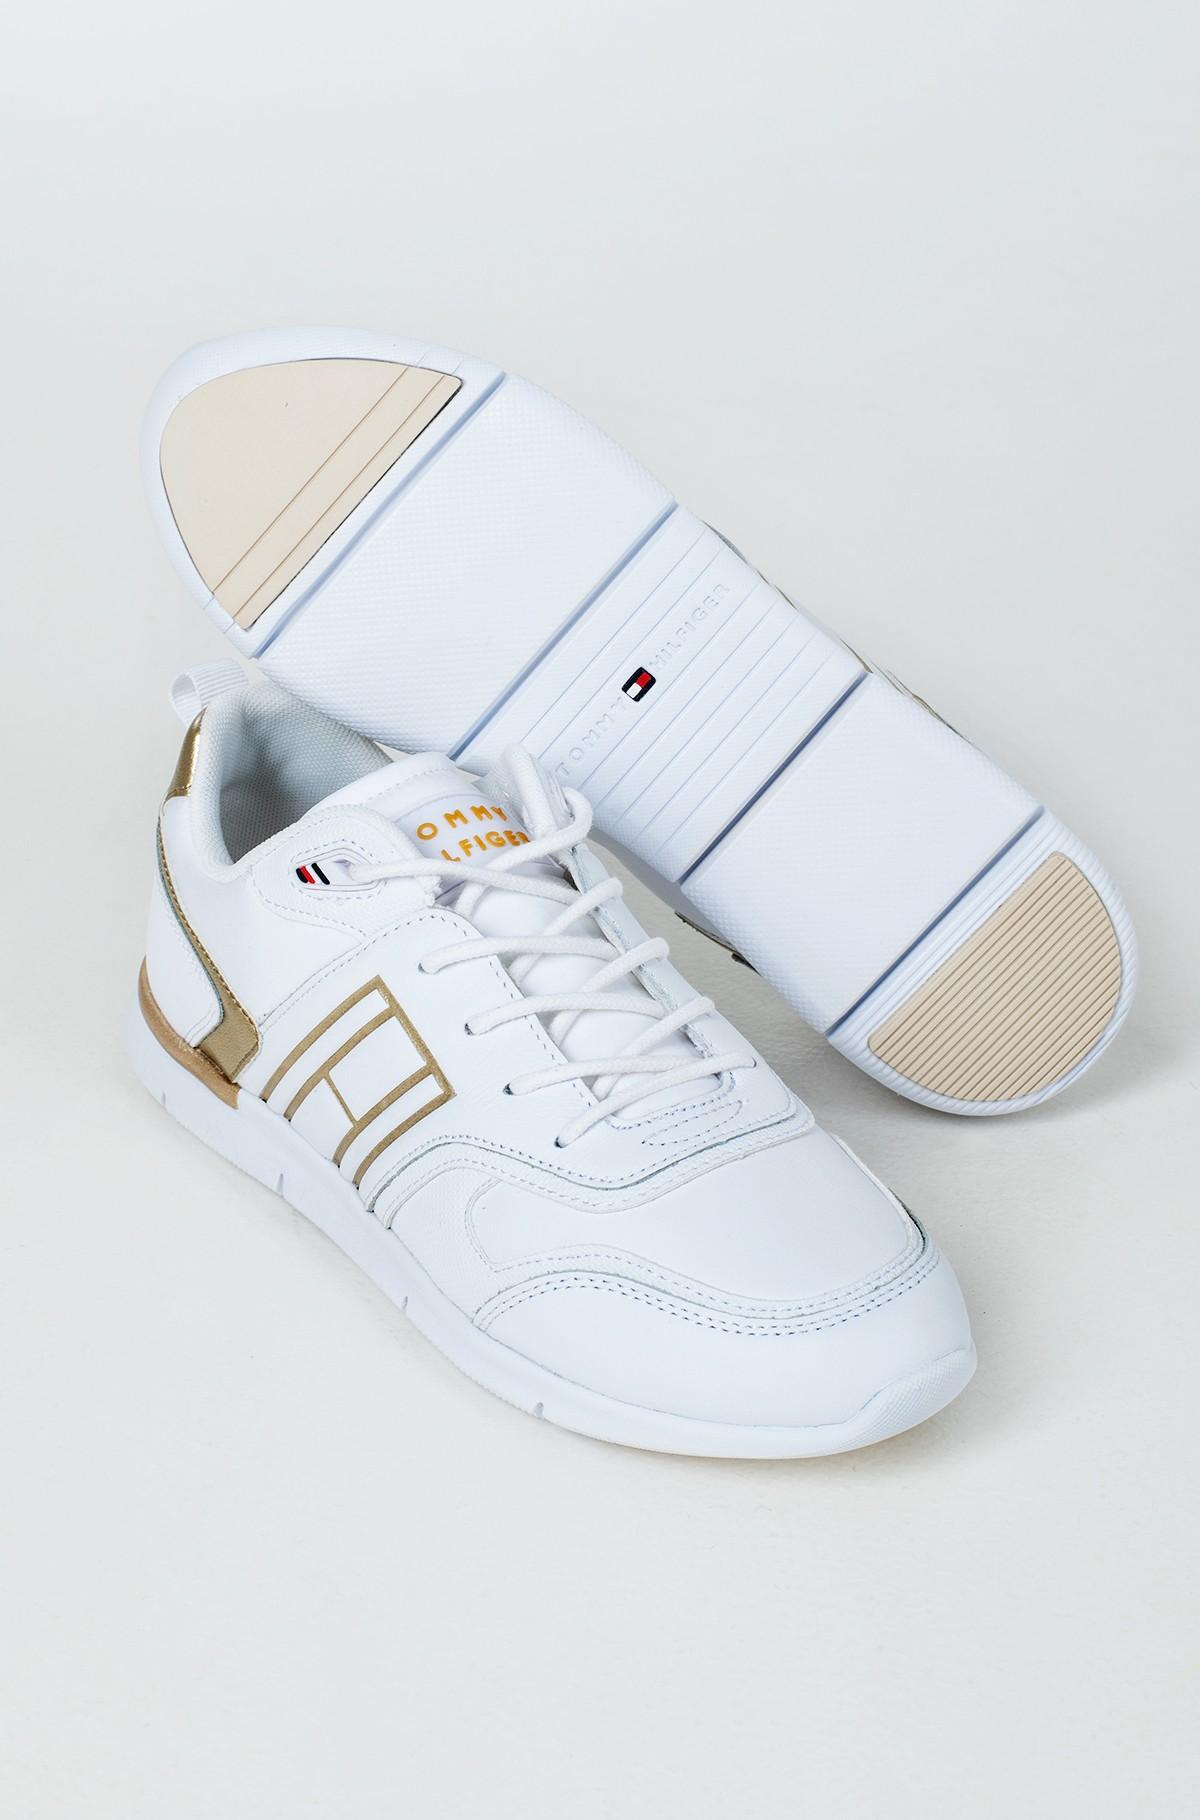 Casual shoes METALLIC LIGHTWEIGHT SNEAKER-full-1